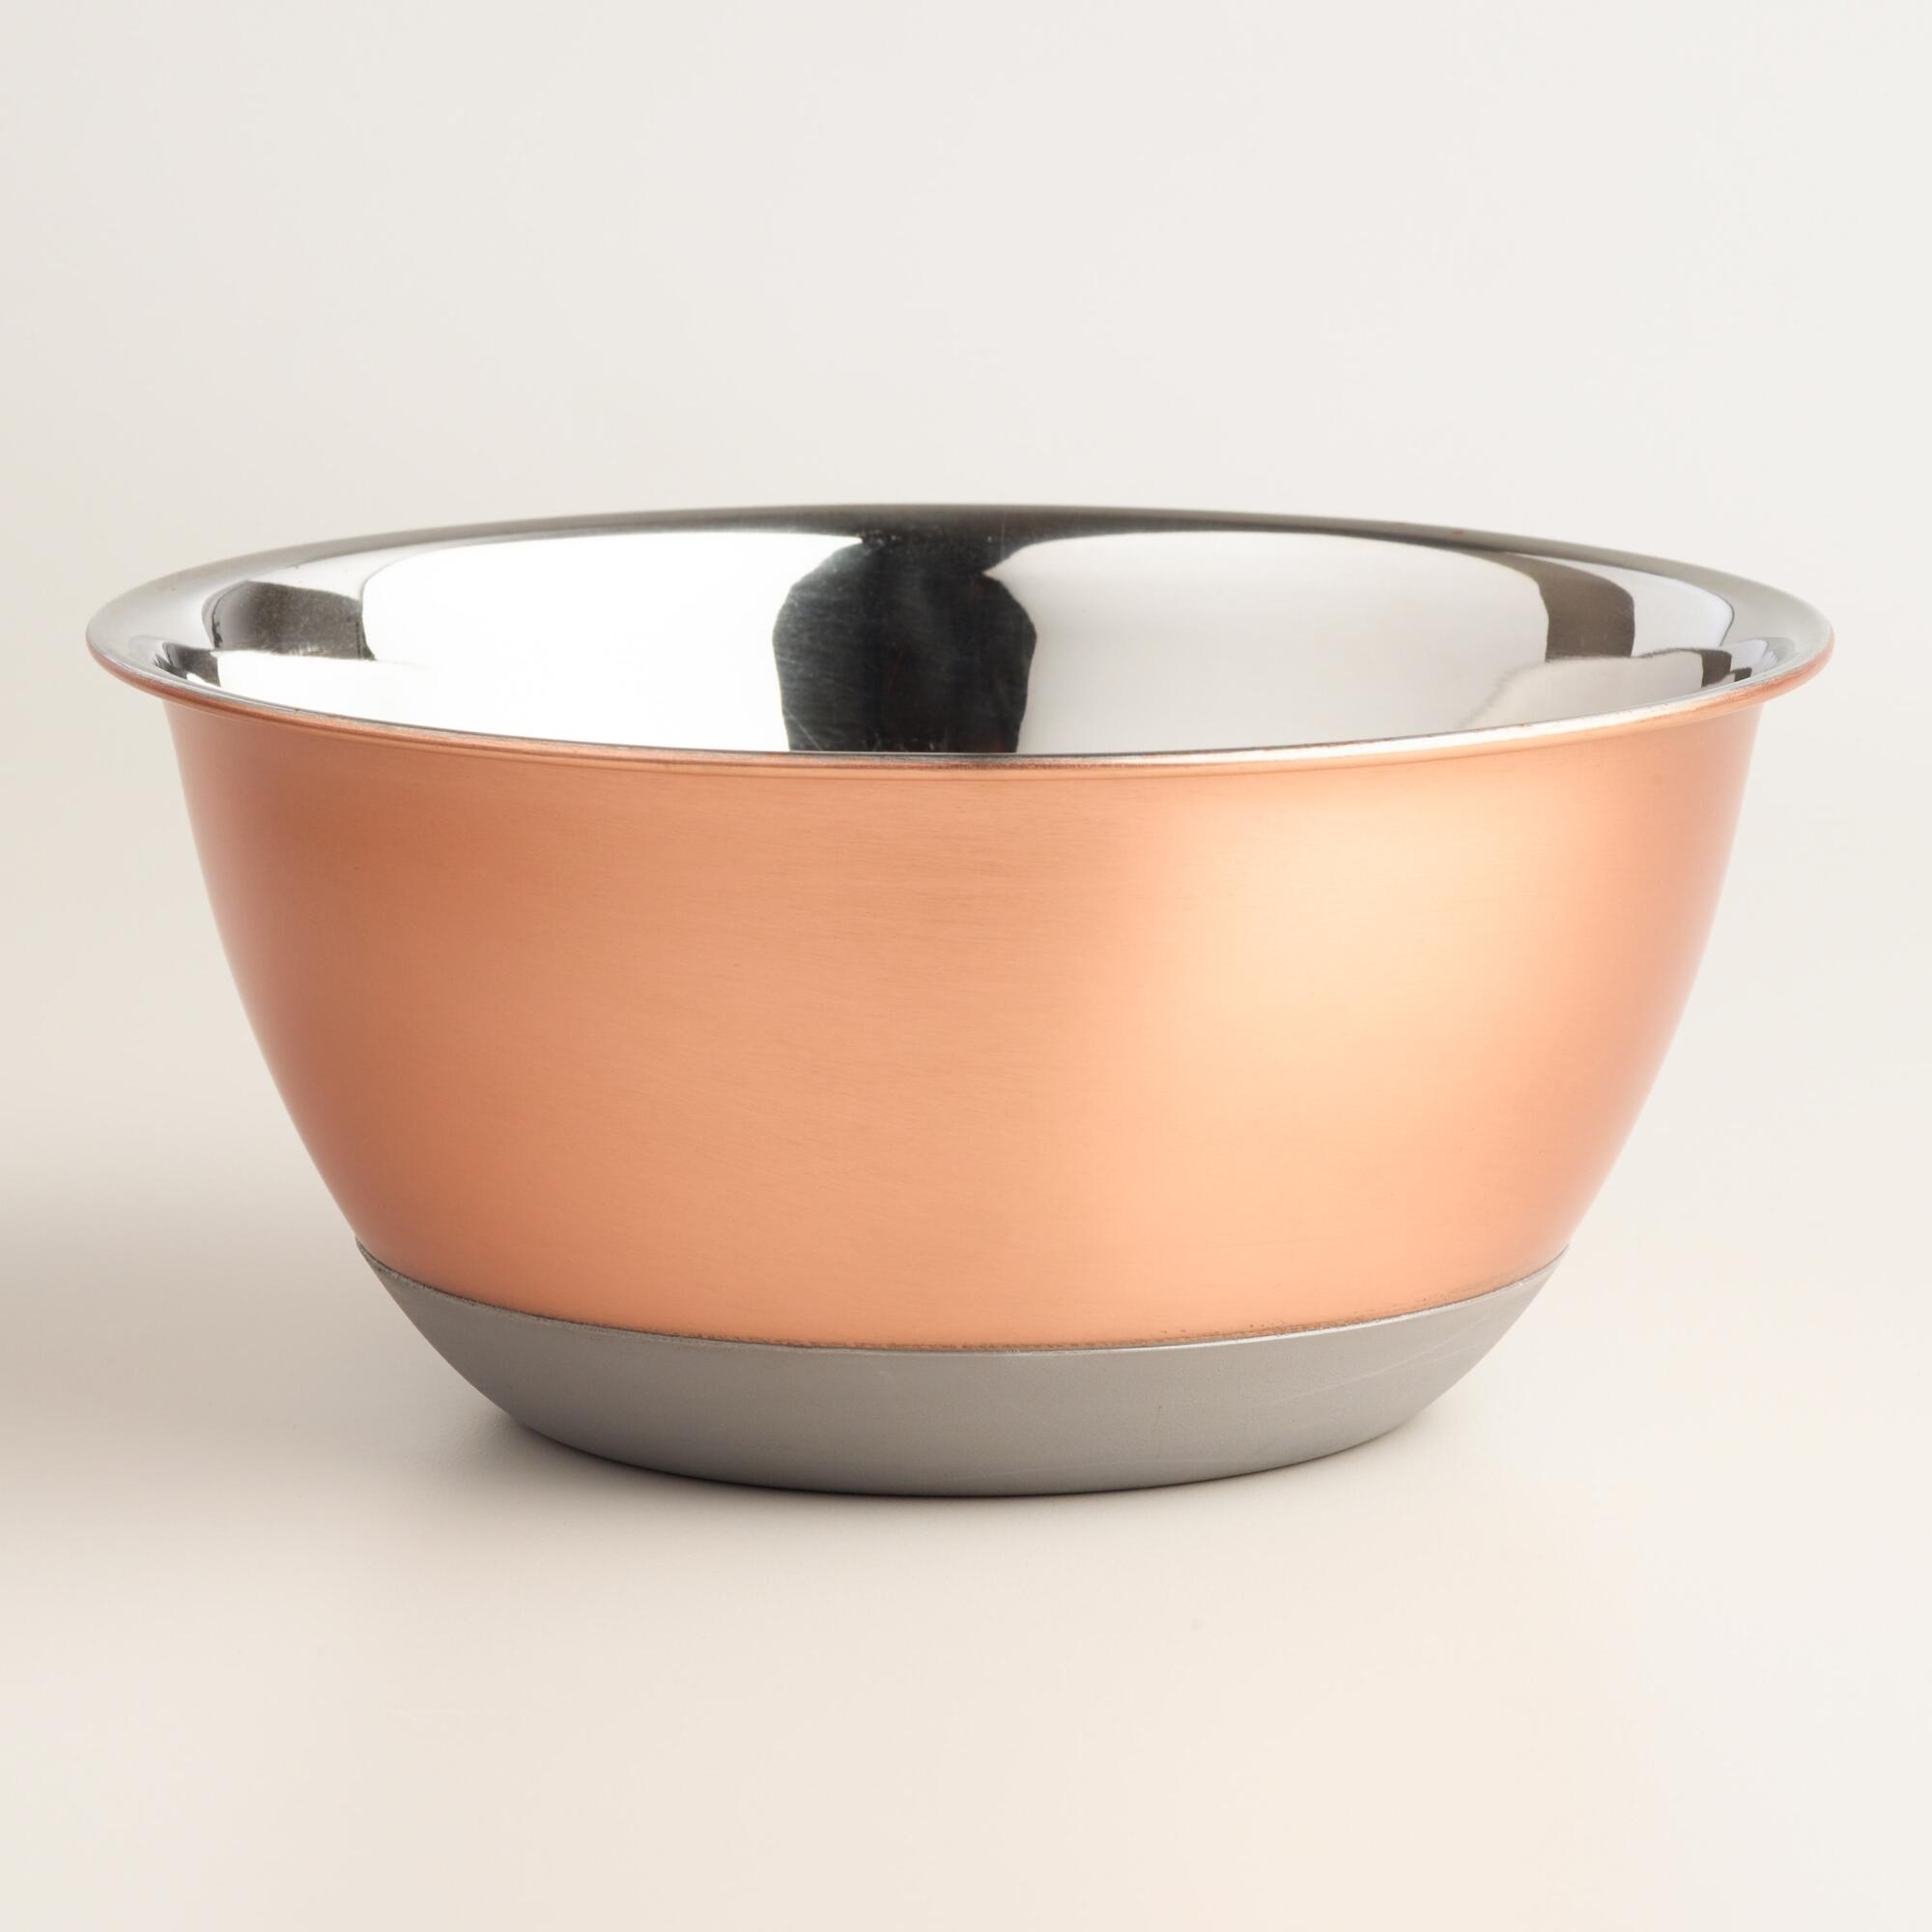 2 Quart Copper Nonskid Mixing Bowl   World Market